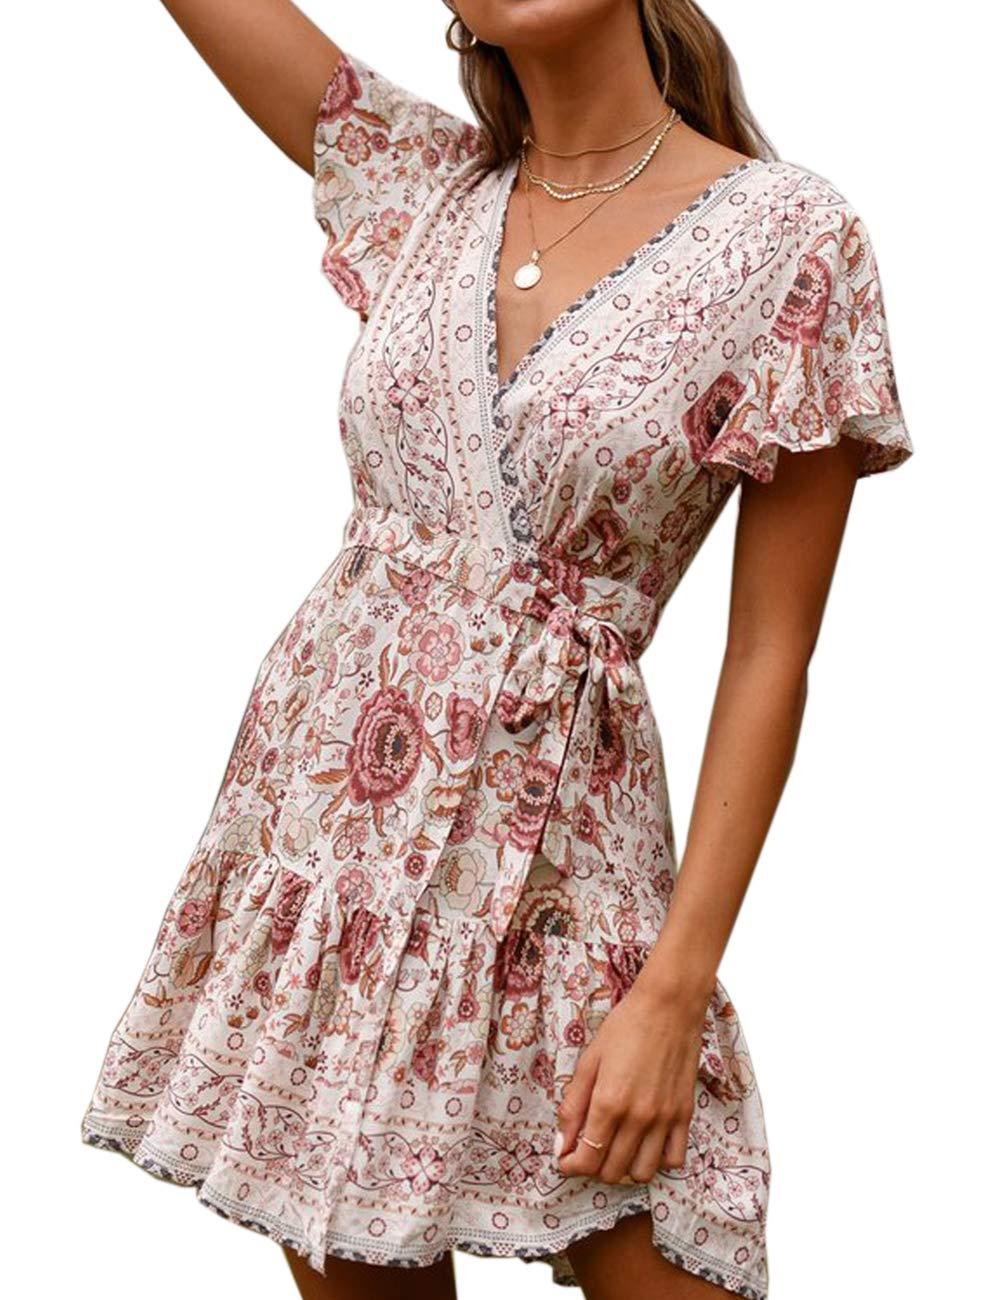 Women's Dresses Summer Bohemian Floral Wrapped Hem V-Neck Dress Beach Coverup